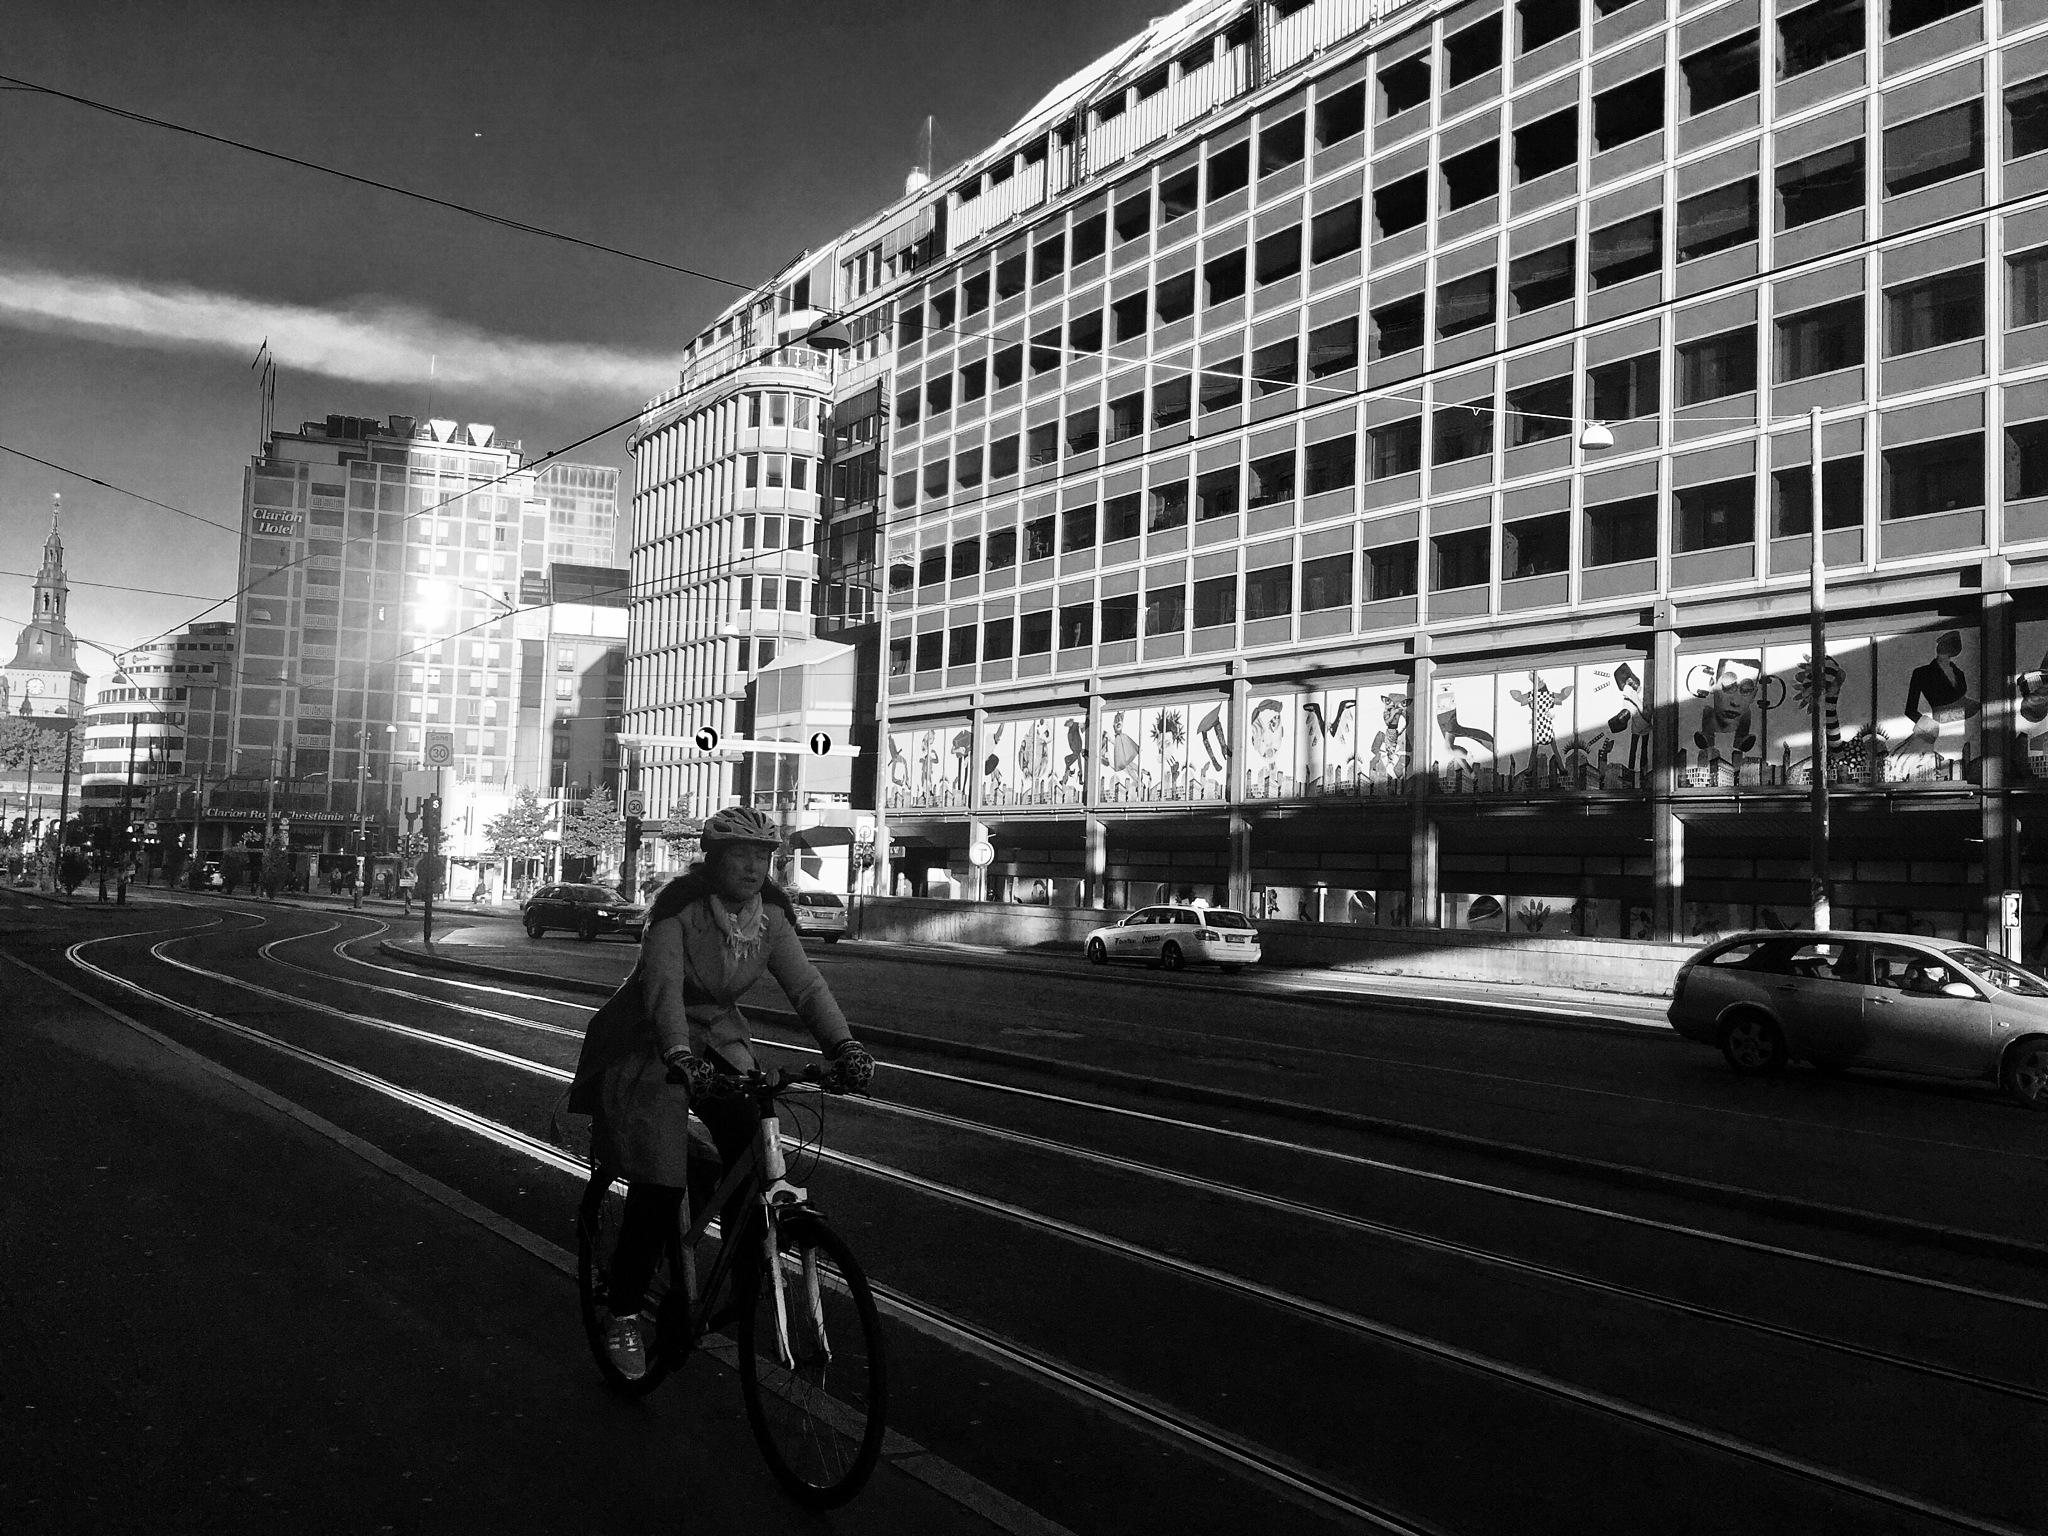 Morning in Oslo  by Goran Jorganovich